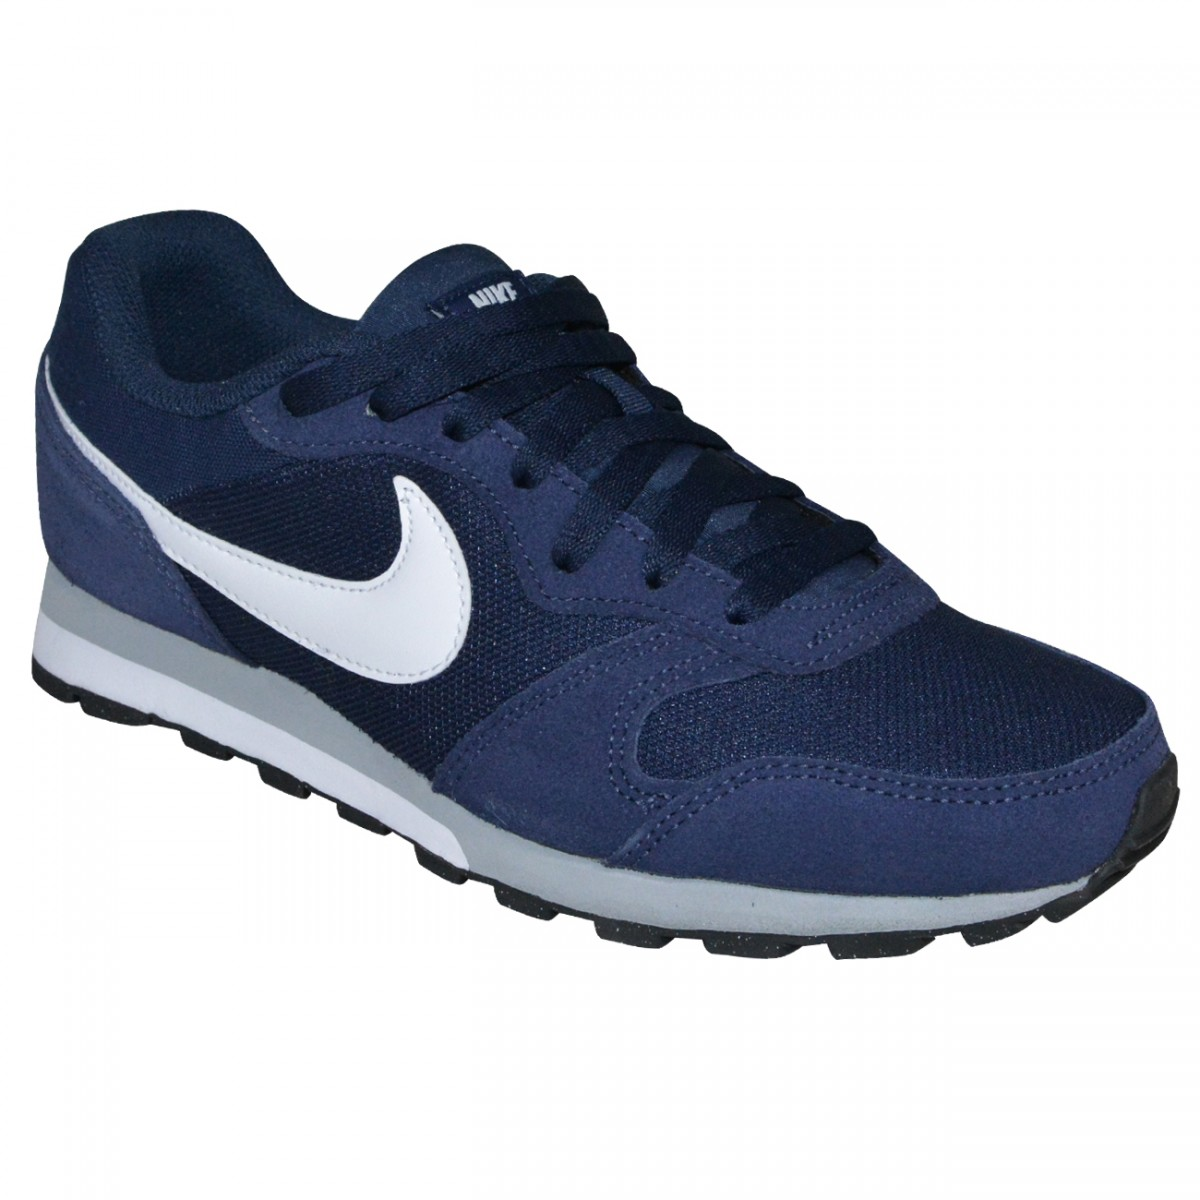 0bea283e30 Tenis Nike MD Runner 2 749794 410 - MARINHO BRANCO CINZA - Chuteira Nike